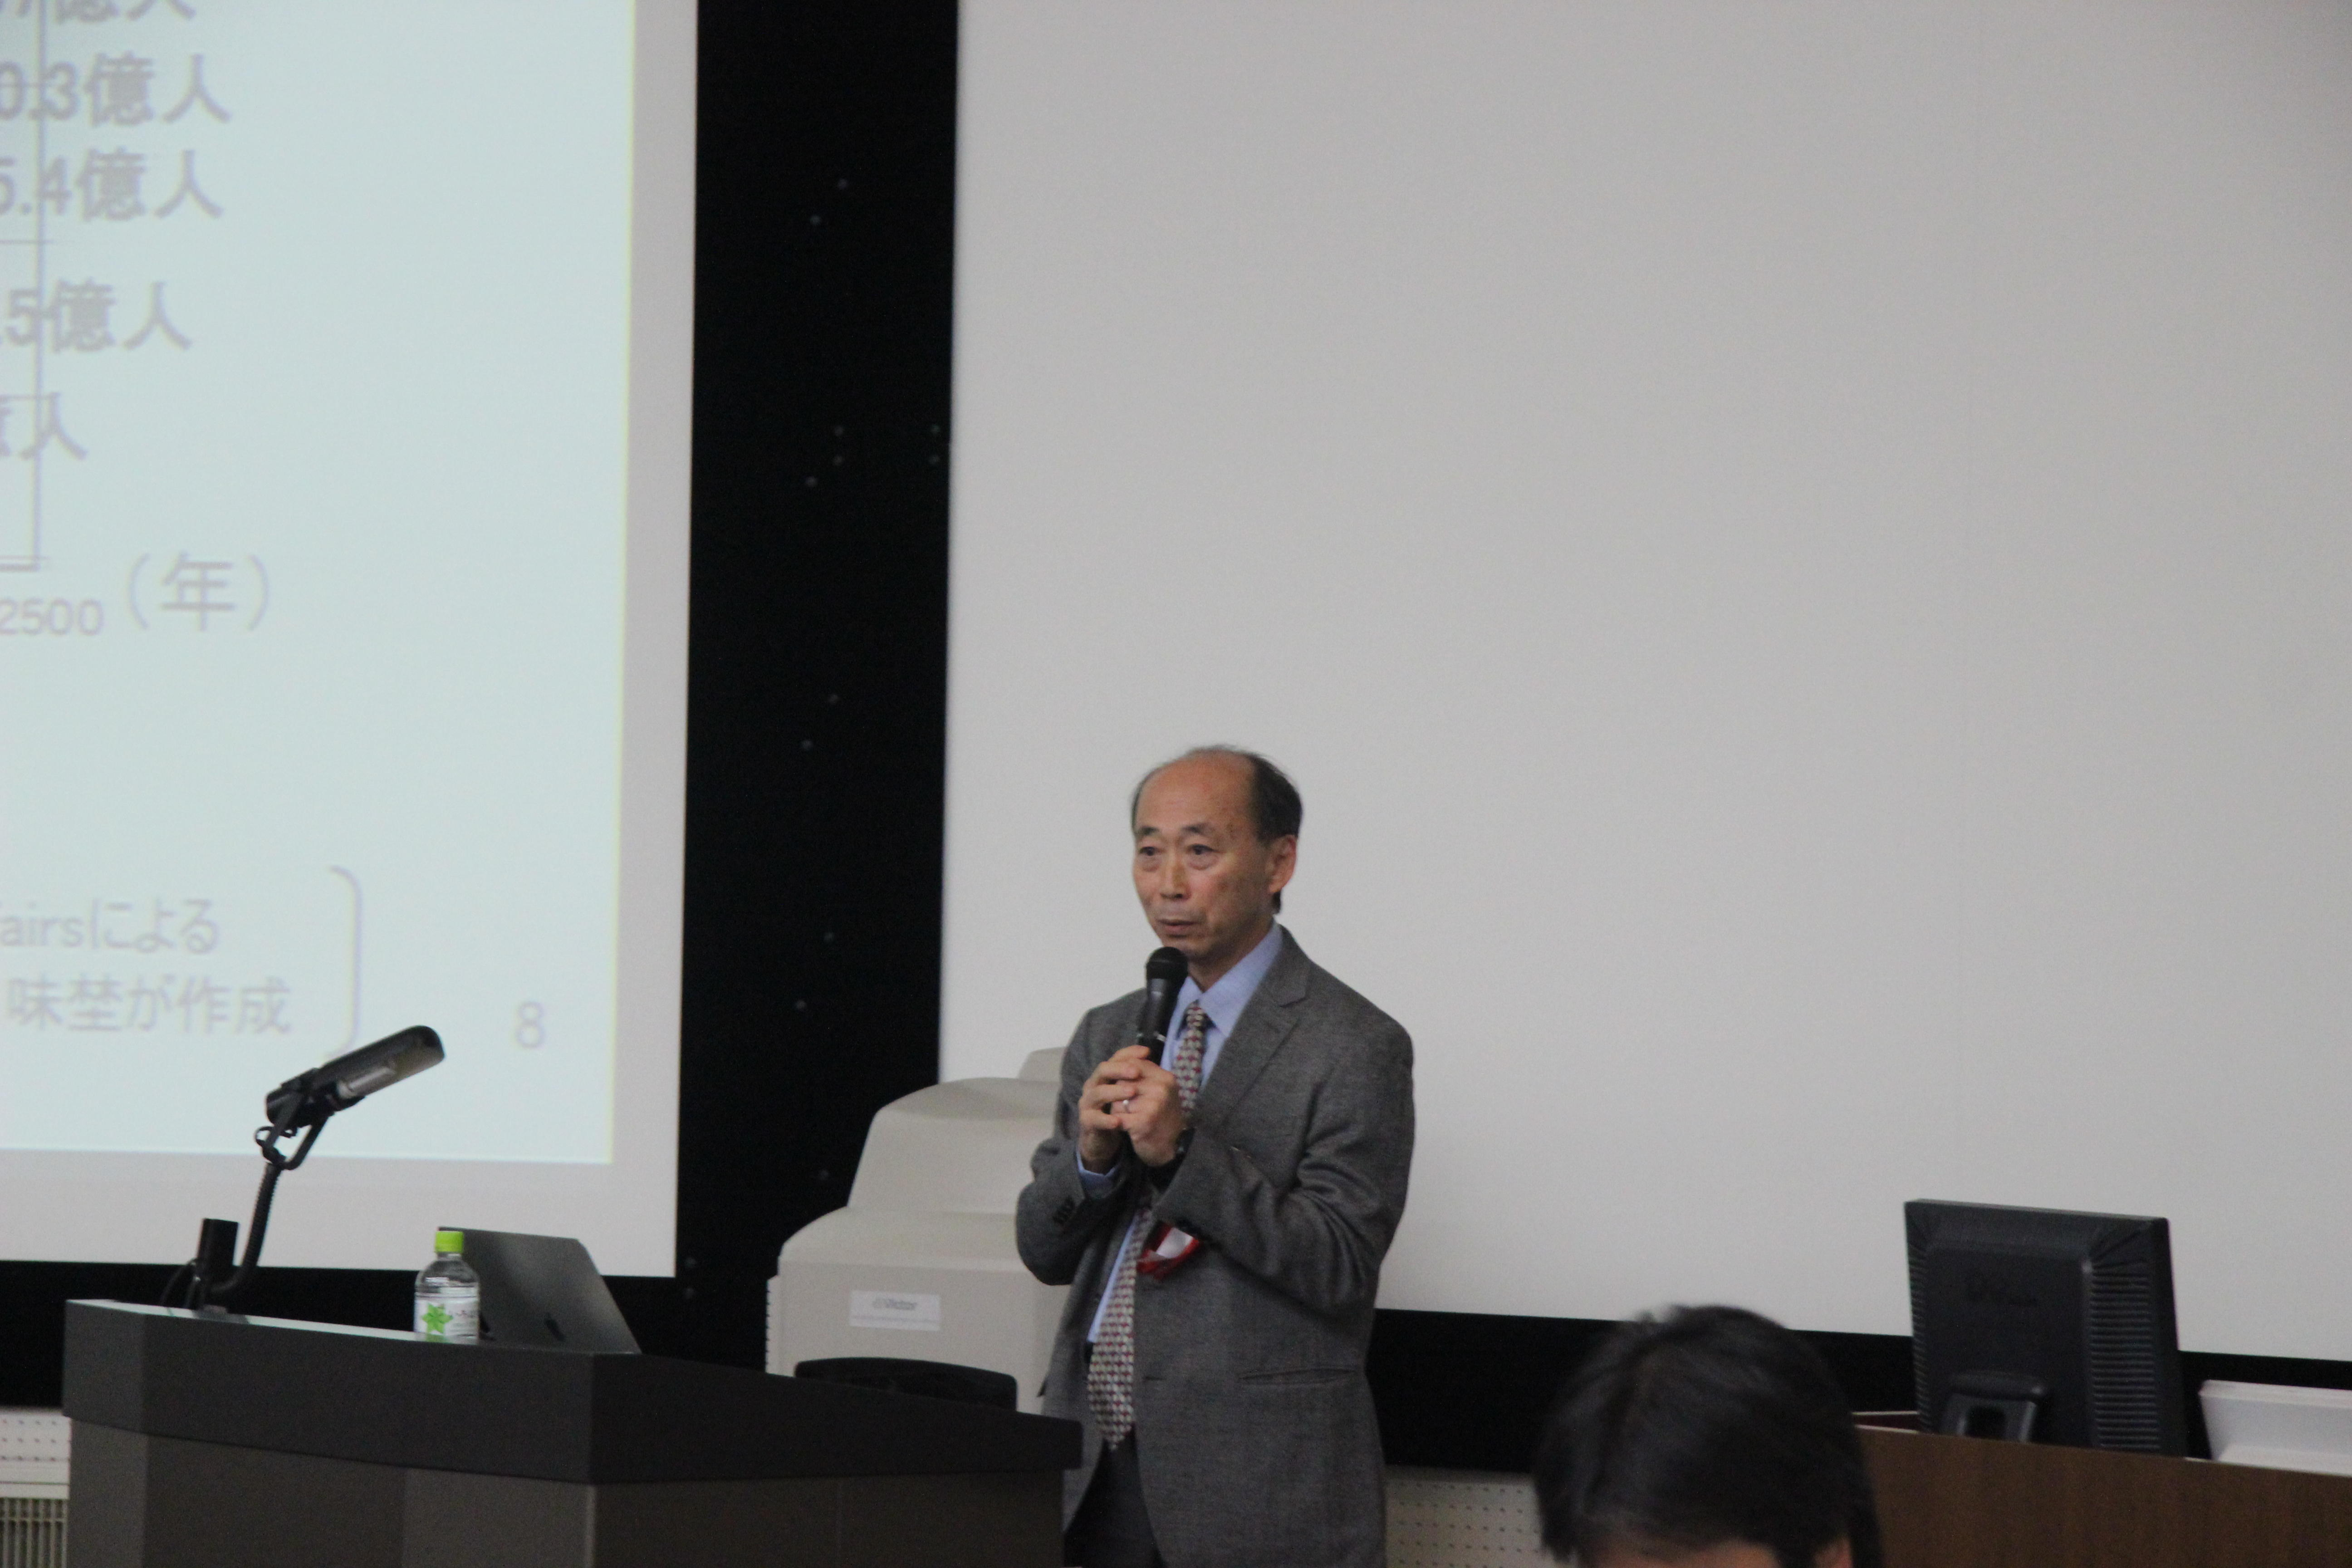 SDGs講演会HP掲載用写真1.JPG